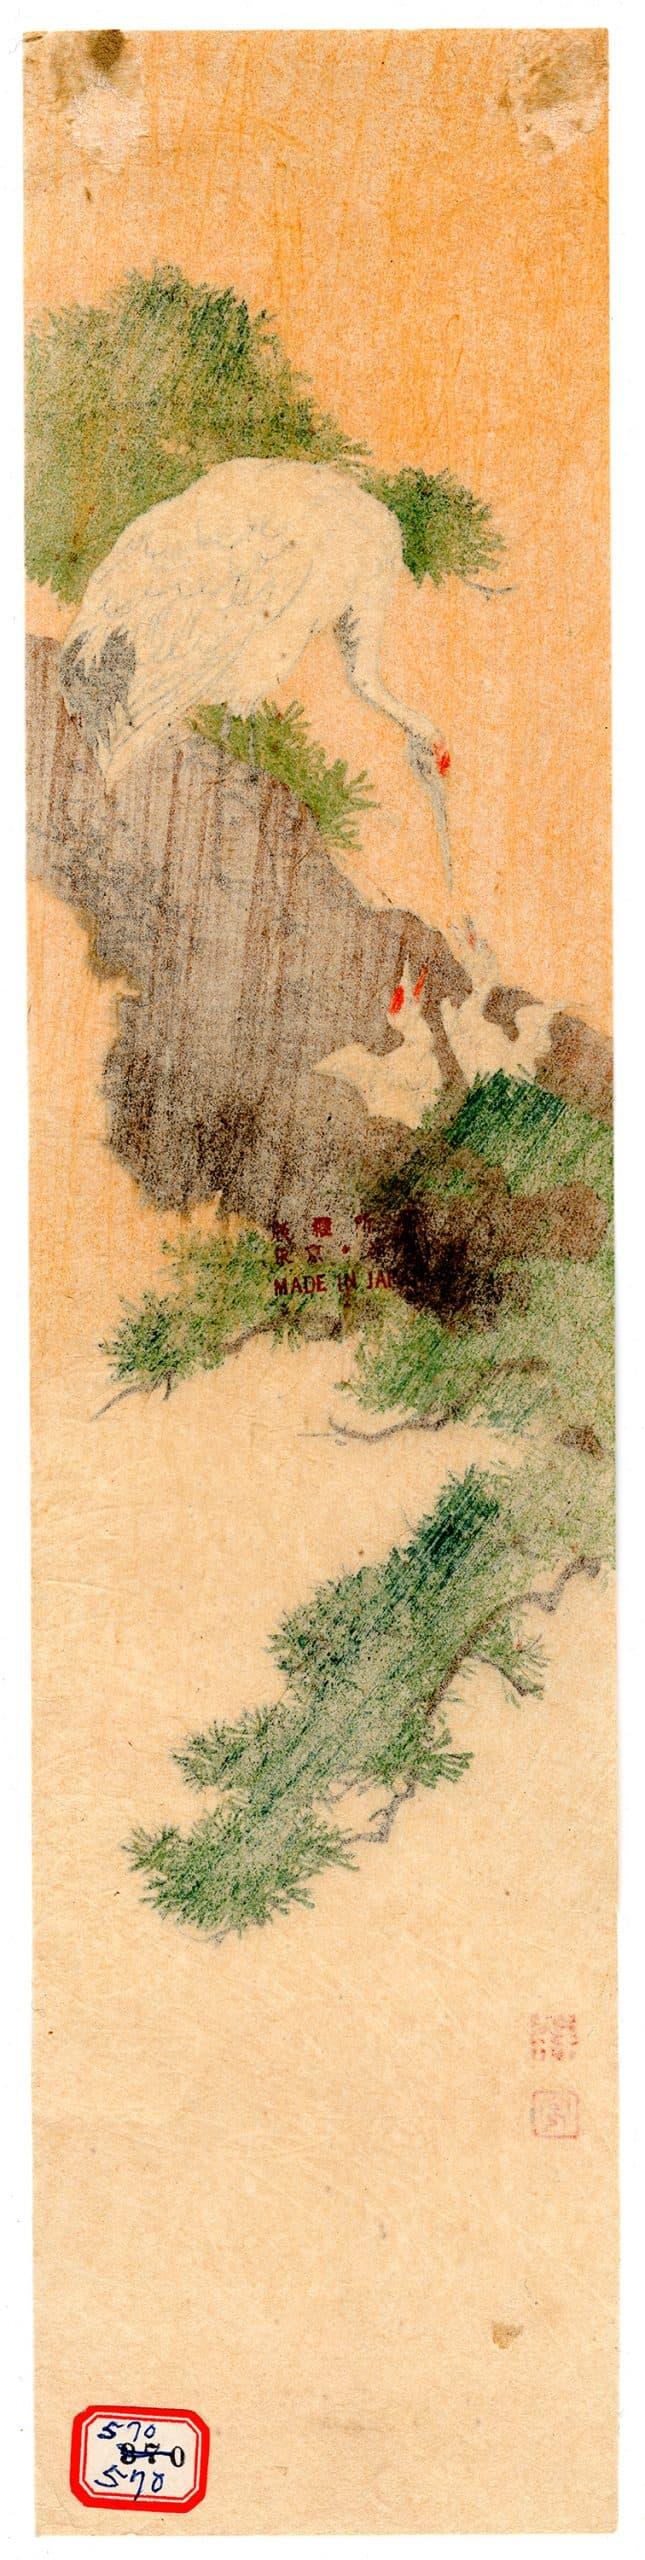 Shoda Koho - Heron and Chicks (verso)